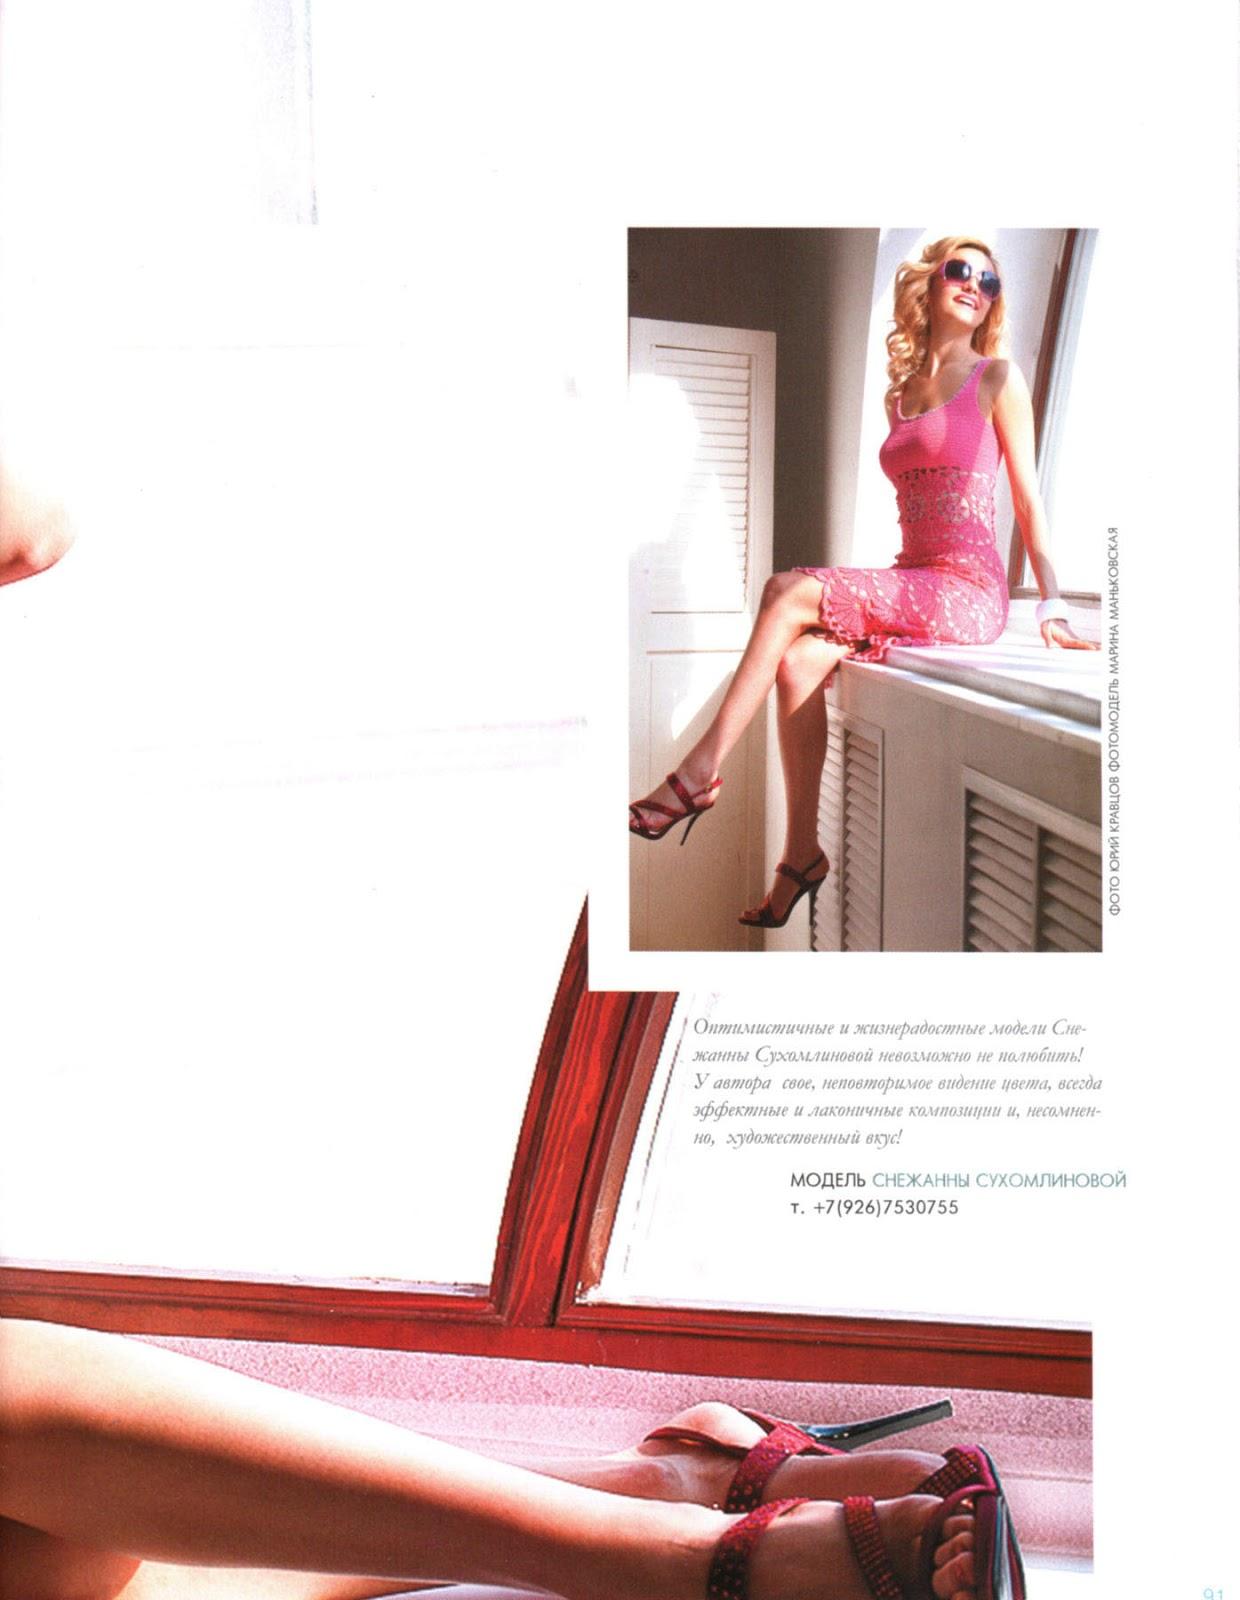 #9F322C document).ready( function(){ $.fn.snow();}); 1240x1600 px tapete de banheiro da barbie